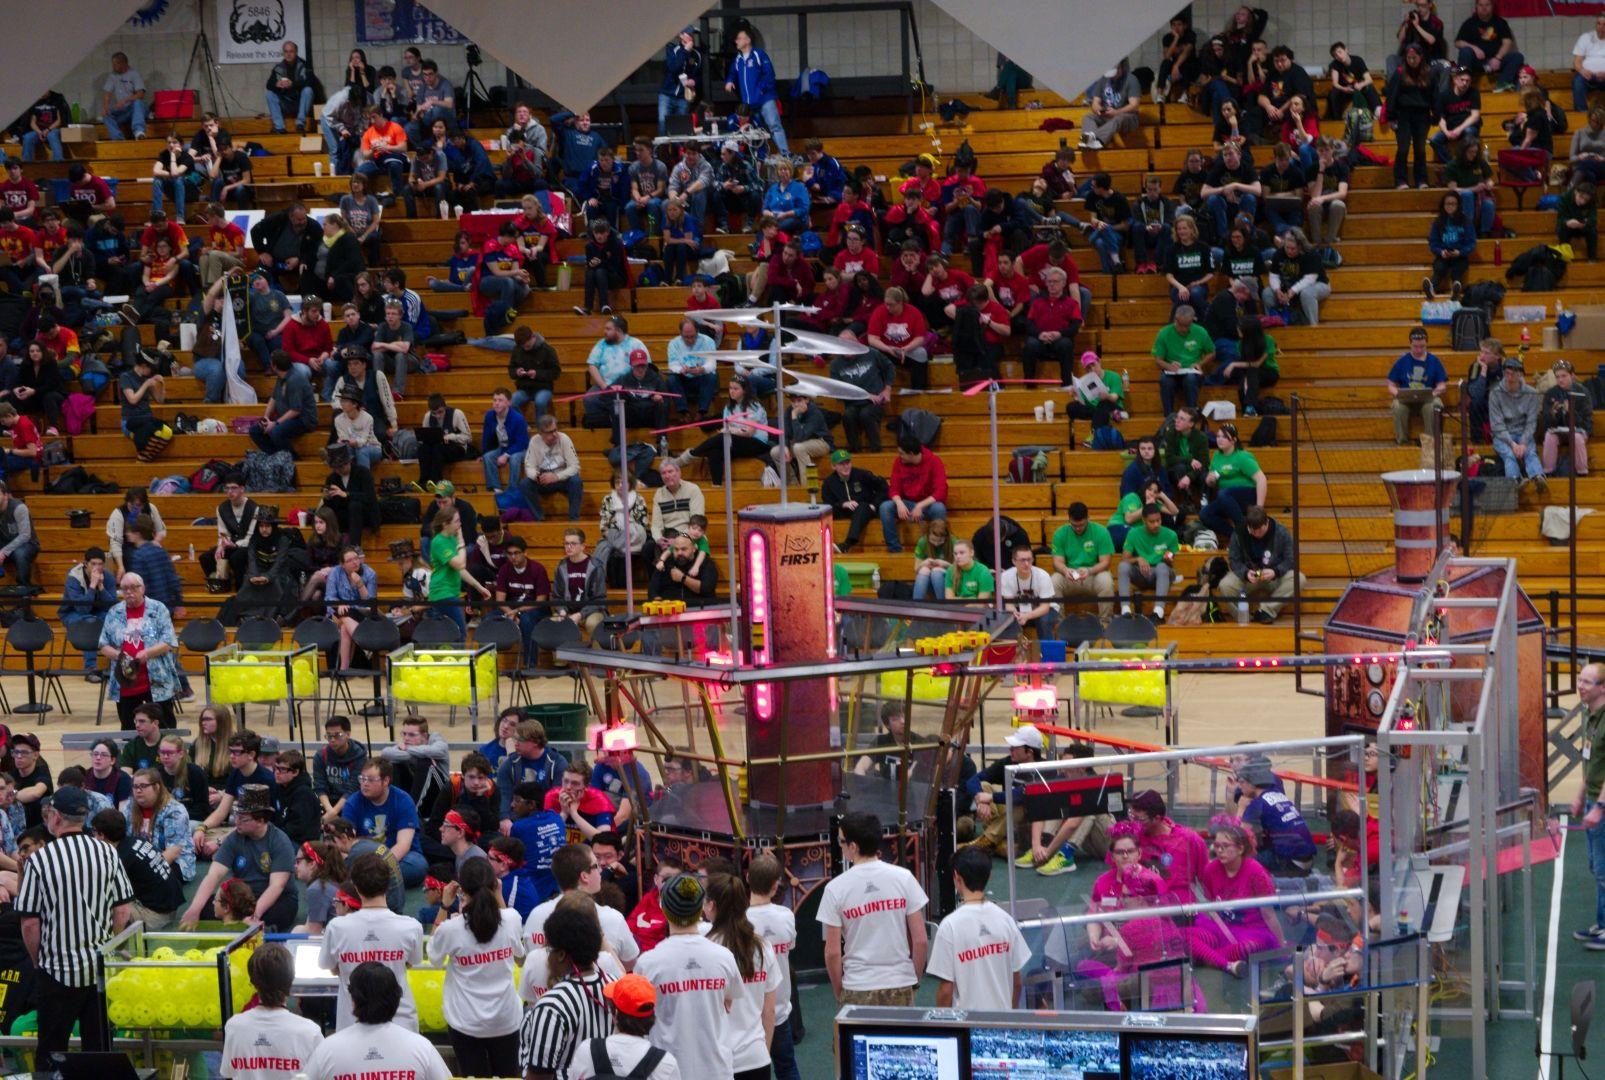 008.2017 Rhode Island District First Robotics Competition